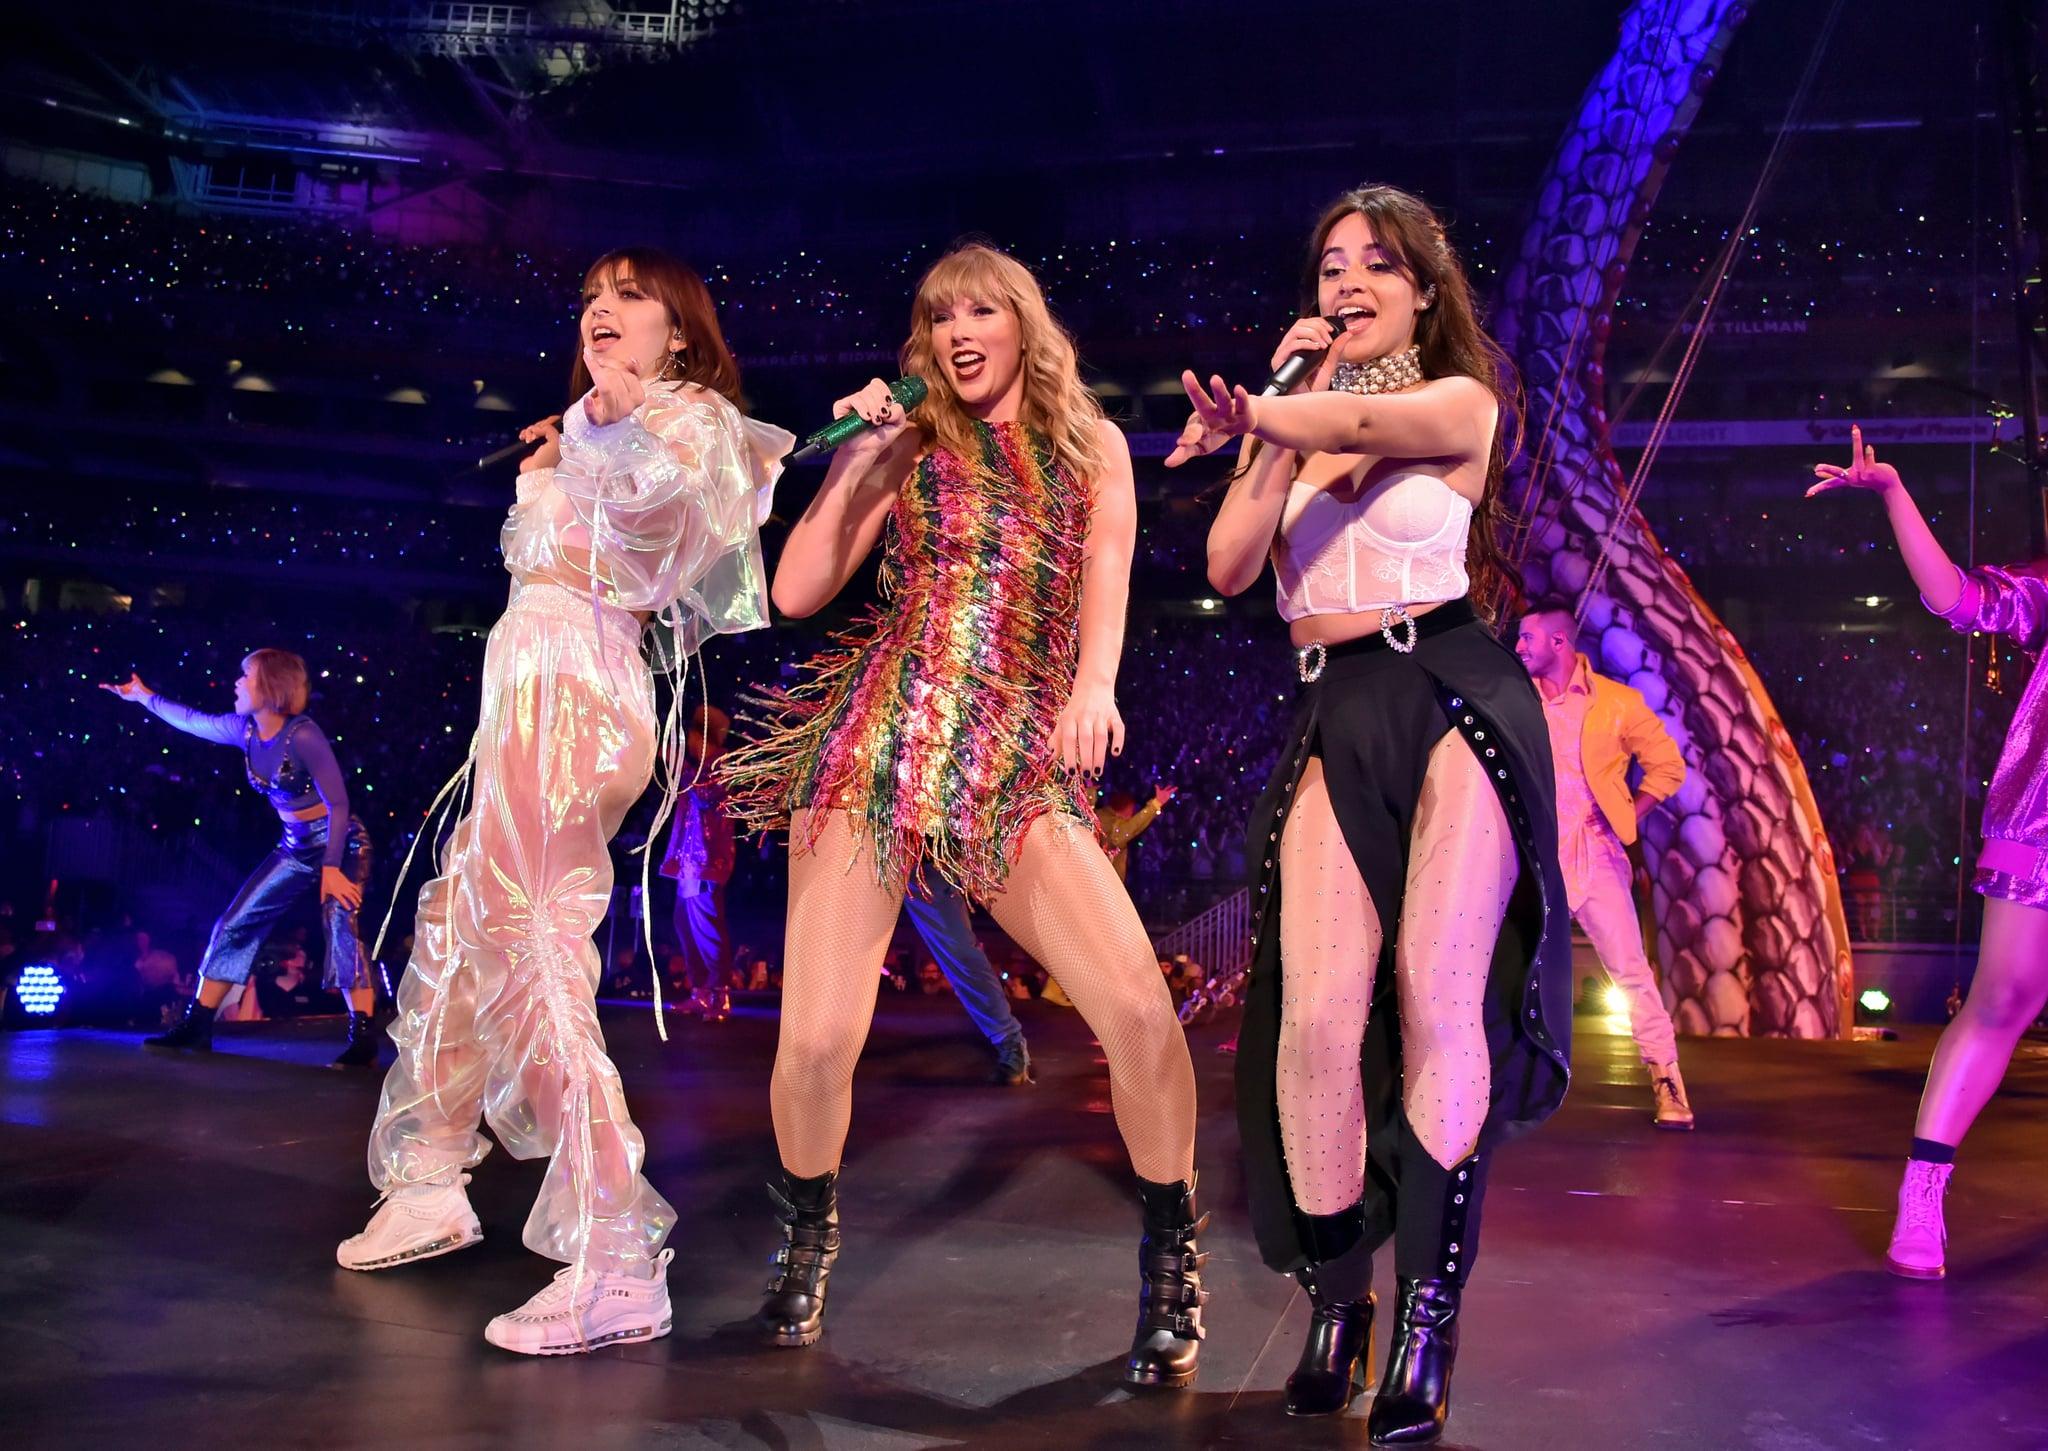 Taylor Swift Reputation Tour Costumes Popsugar Fashion